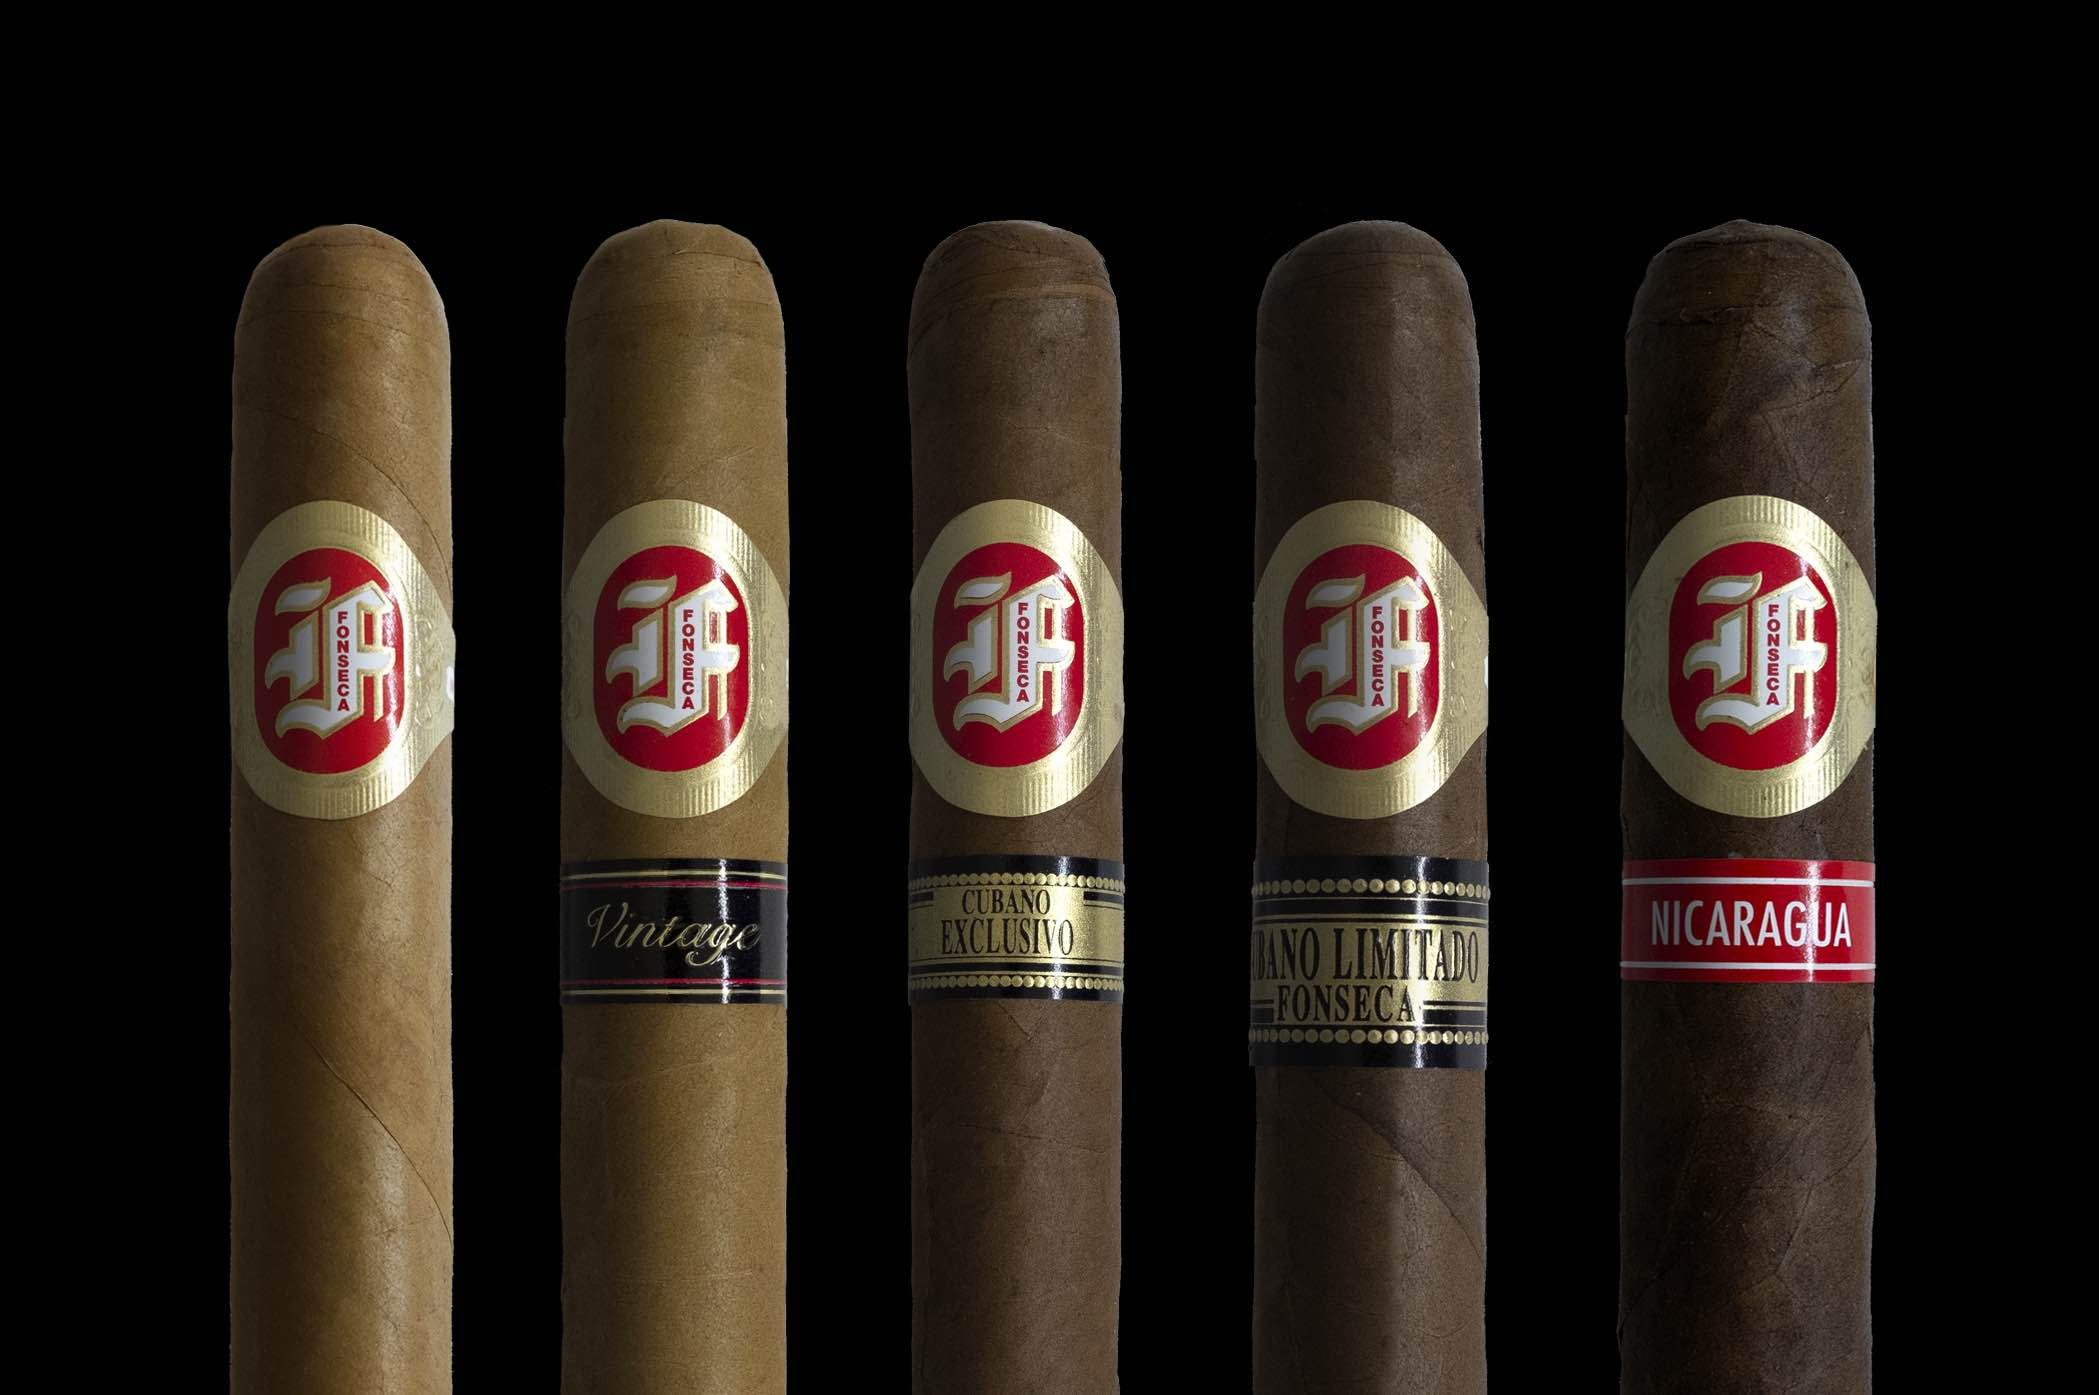 Cigar News: Quesada Cigars Completes Revamping Fonseca Brand